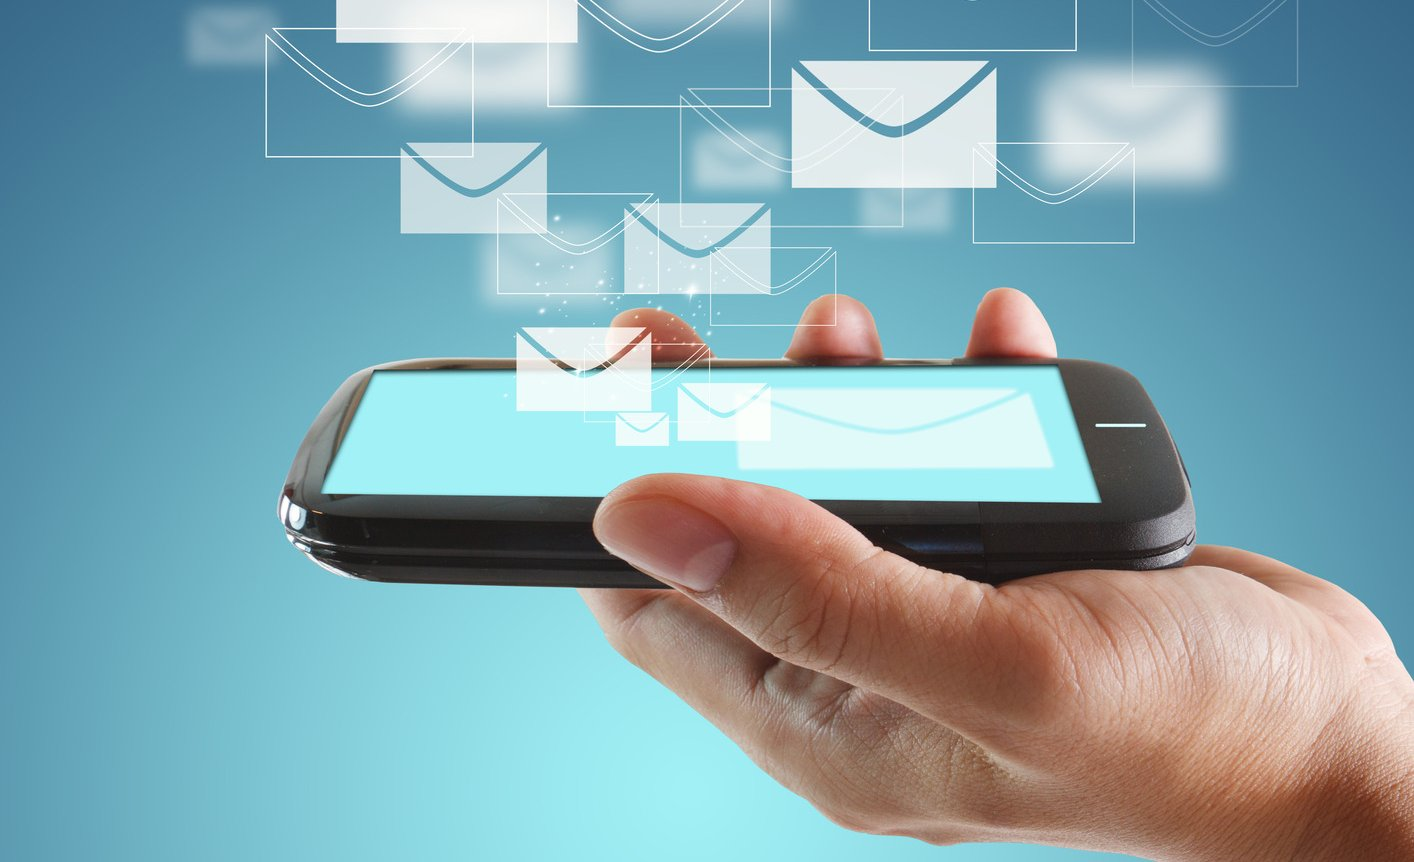 МТС, Билайн и Мегафон распространяют спам